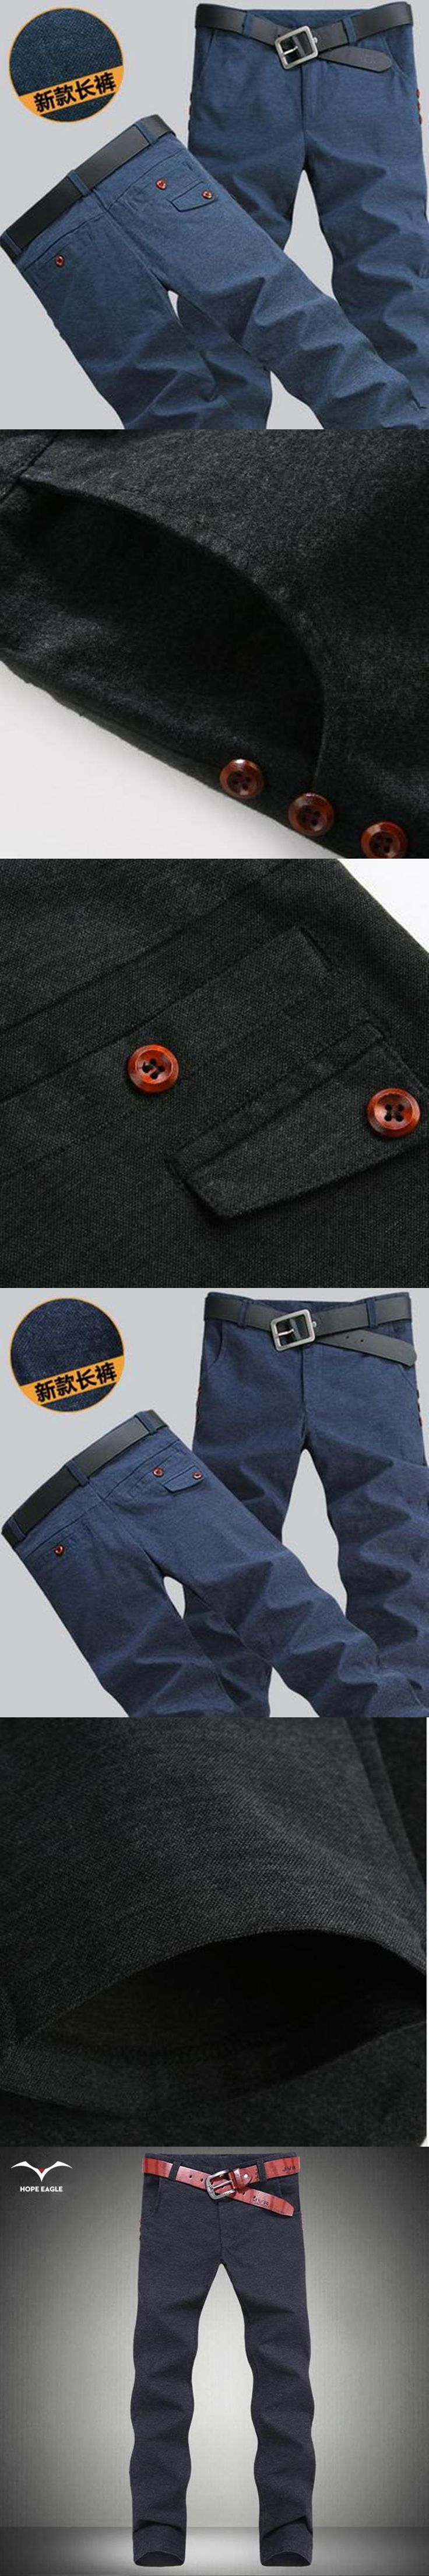 New Hot 2017 mens slim chinos fashion trend XL Men's cotton casual pants feet pants korean all-match Men's Spring Autumn Period